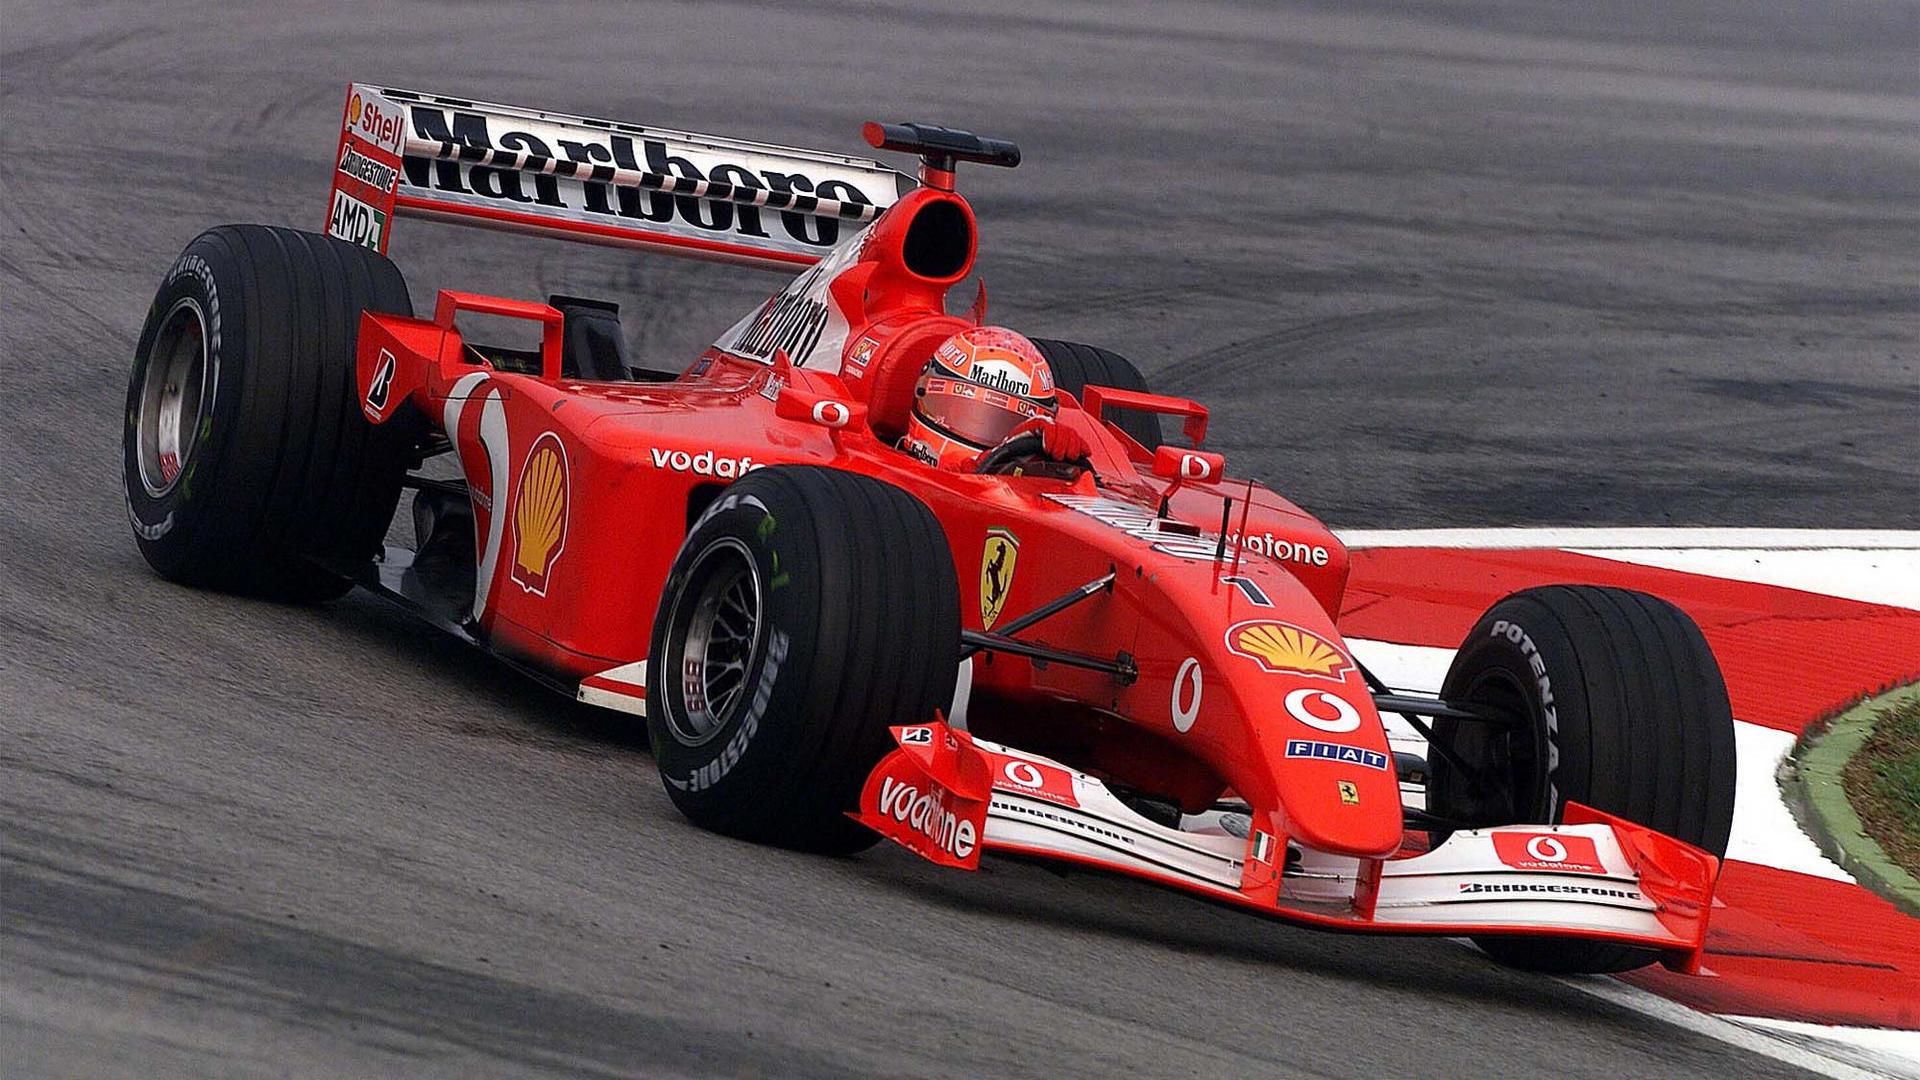 Hd Wallpapers 2002 Formula 1 Grand Prix Of Malaysia F1